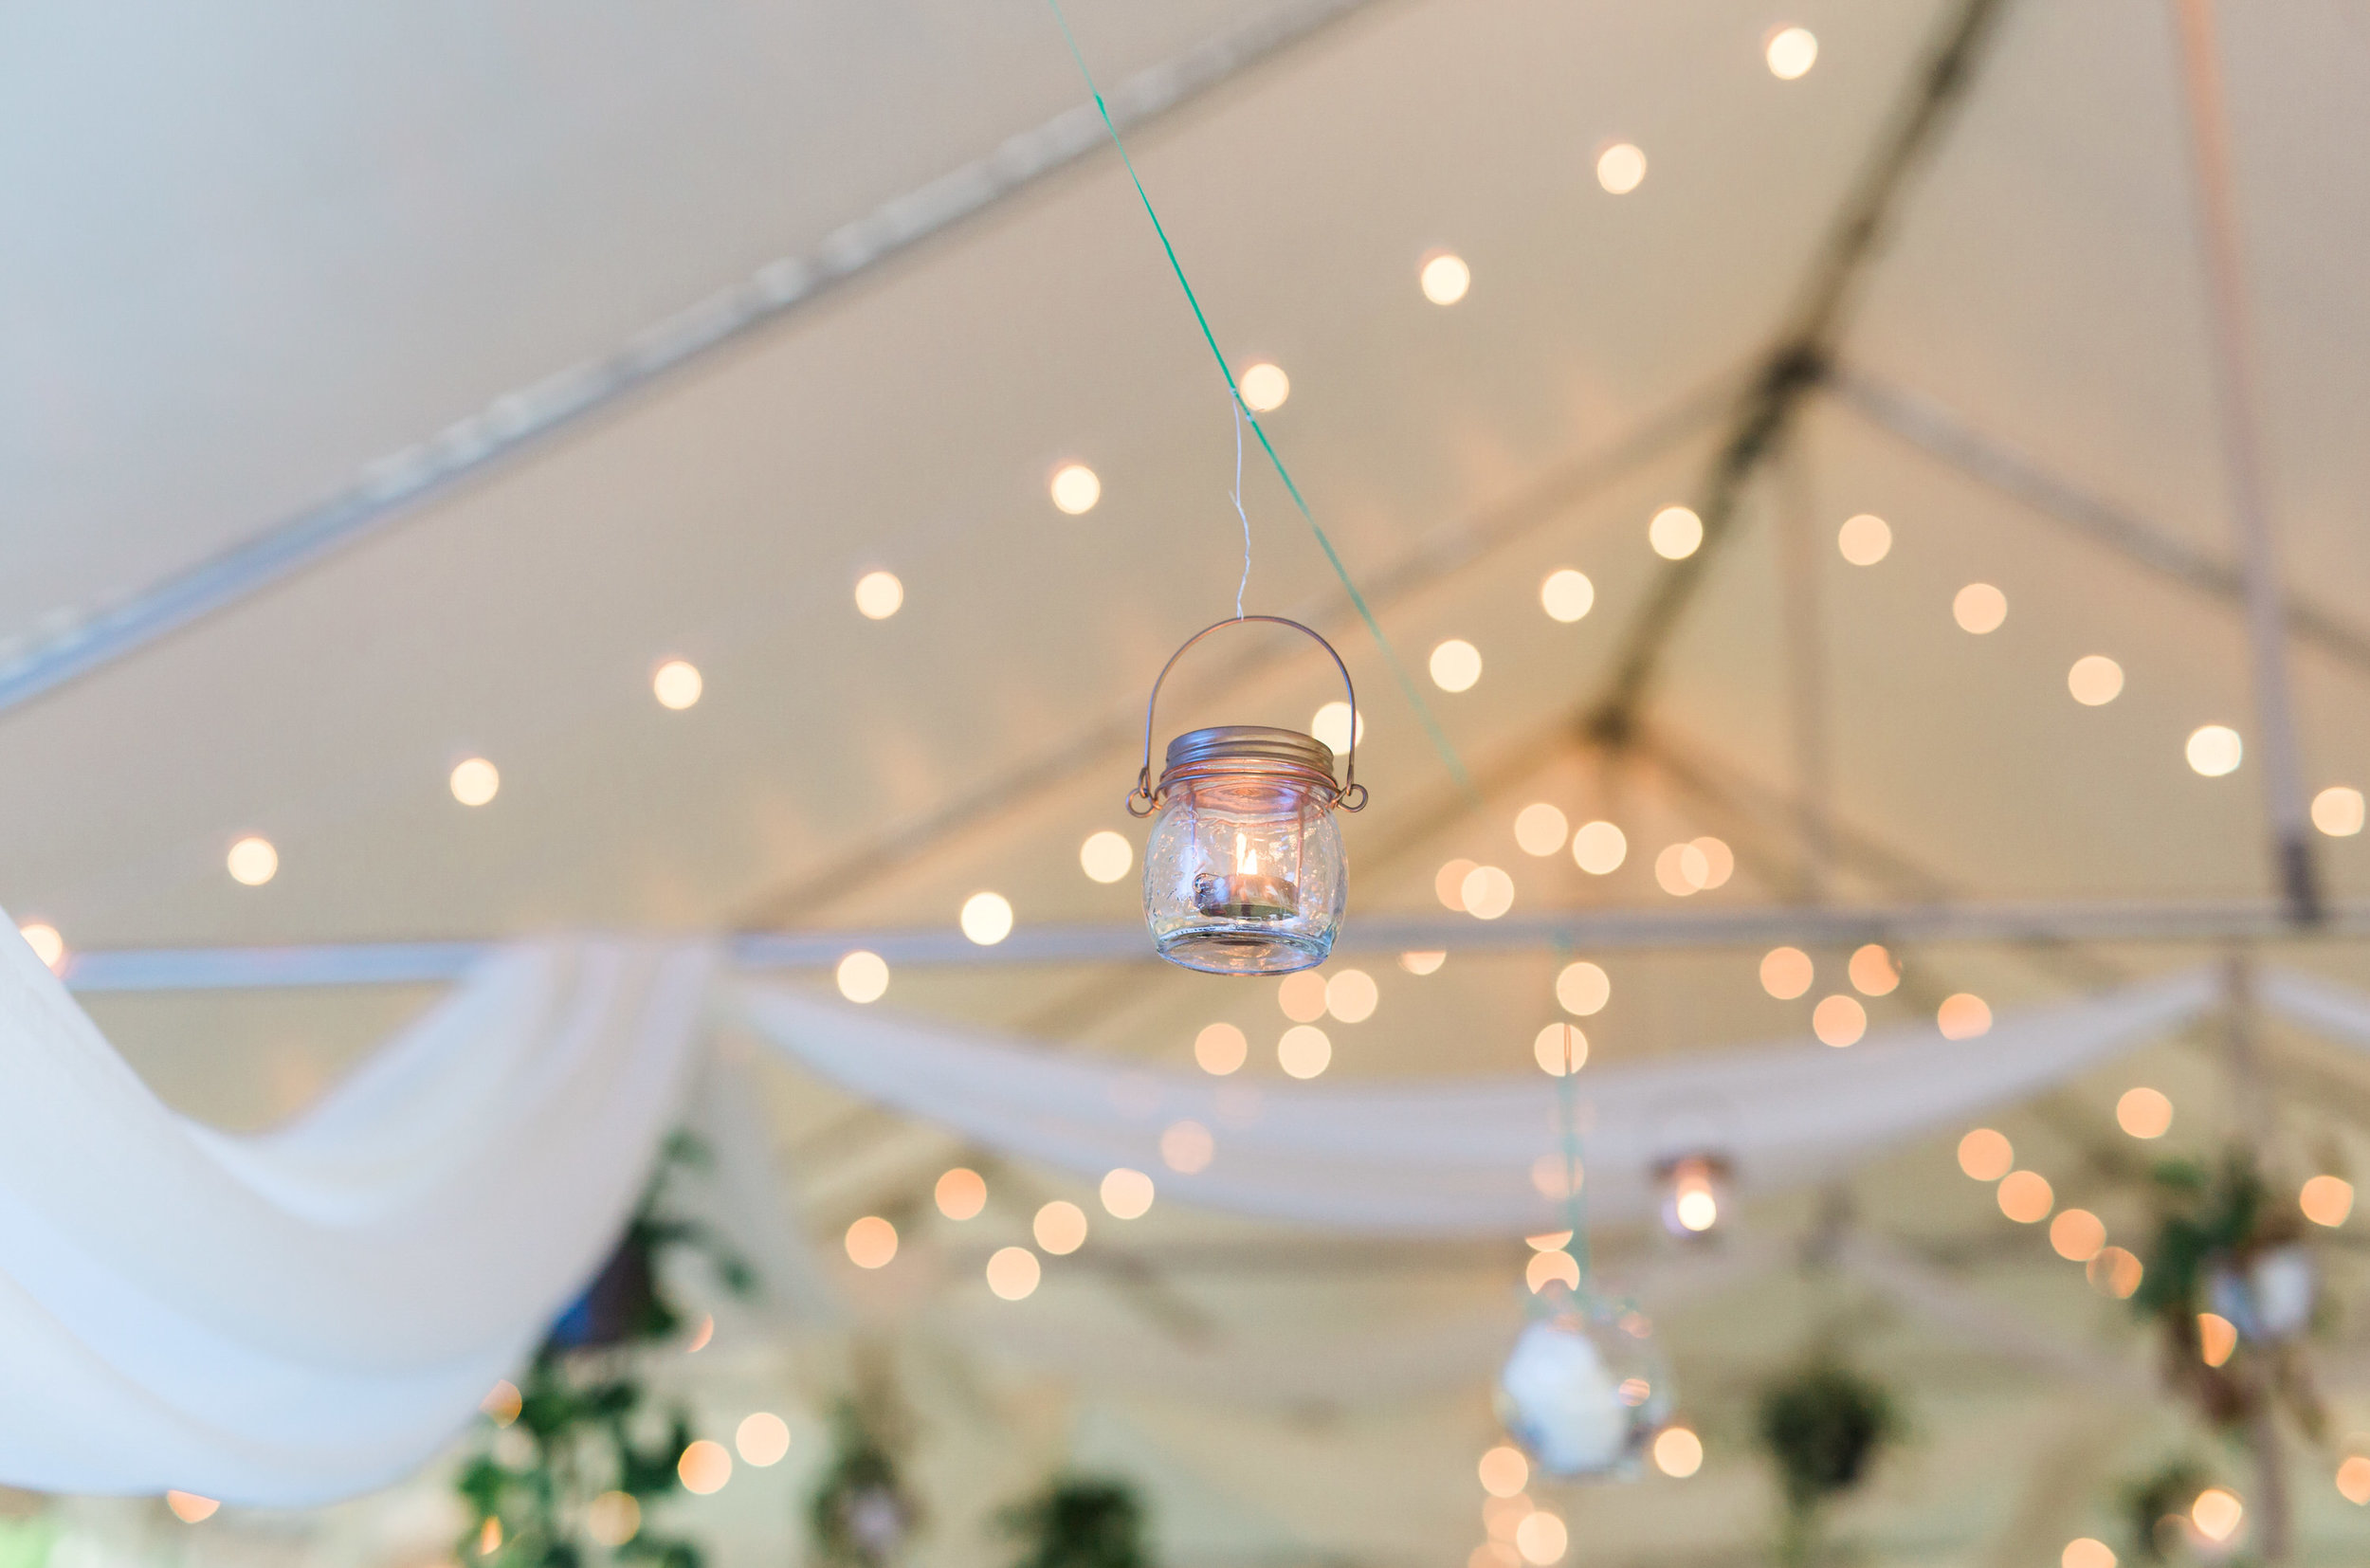 Linwood House Wedding Photos - Roberts Creek Wedding Photos - Vancouver Wedding Photographer & Videographer - Sunshine Coast Wedding Photos - Sunshine Coast Wedding Photographer - Jennifer Picard Photography - IMG_8897.jpg